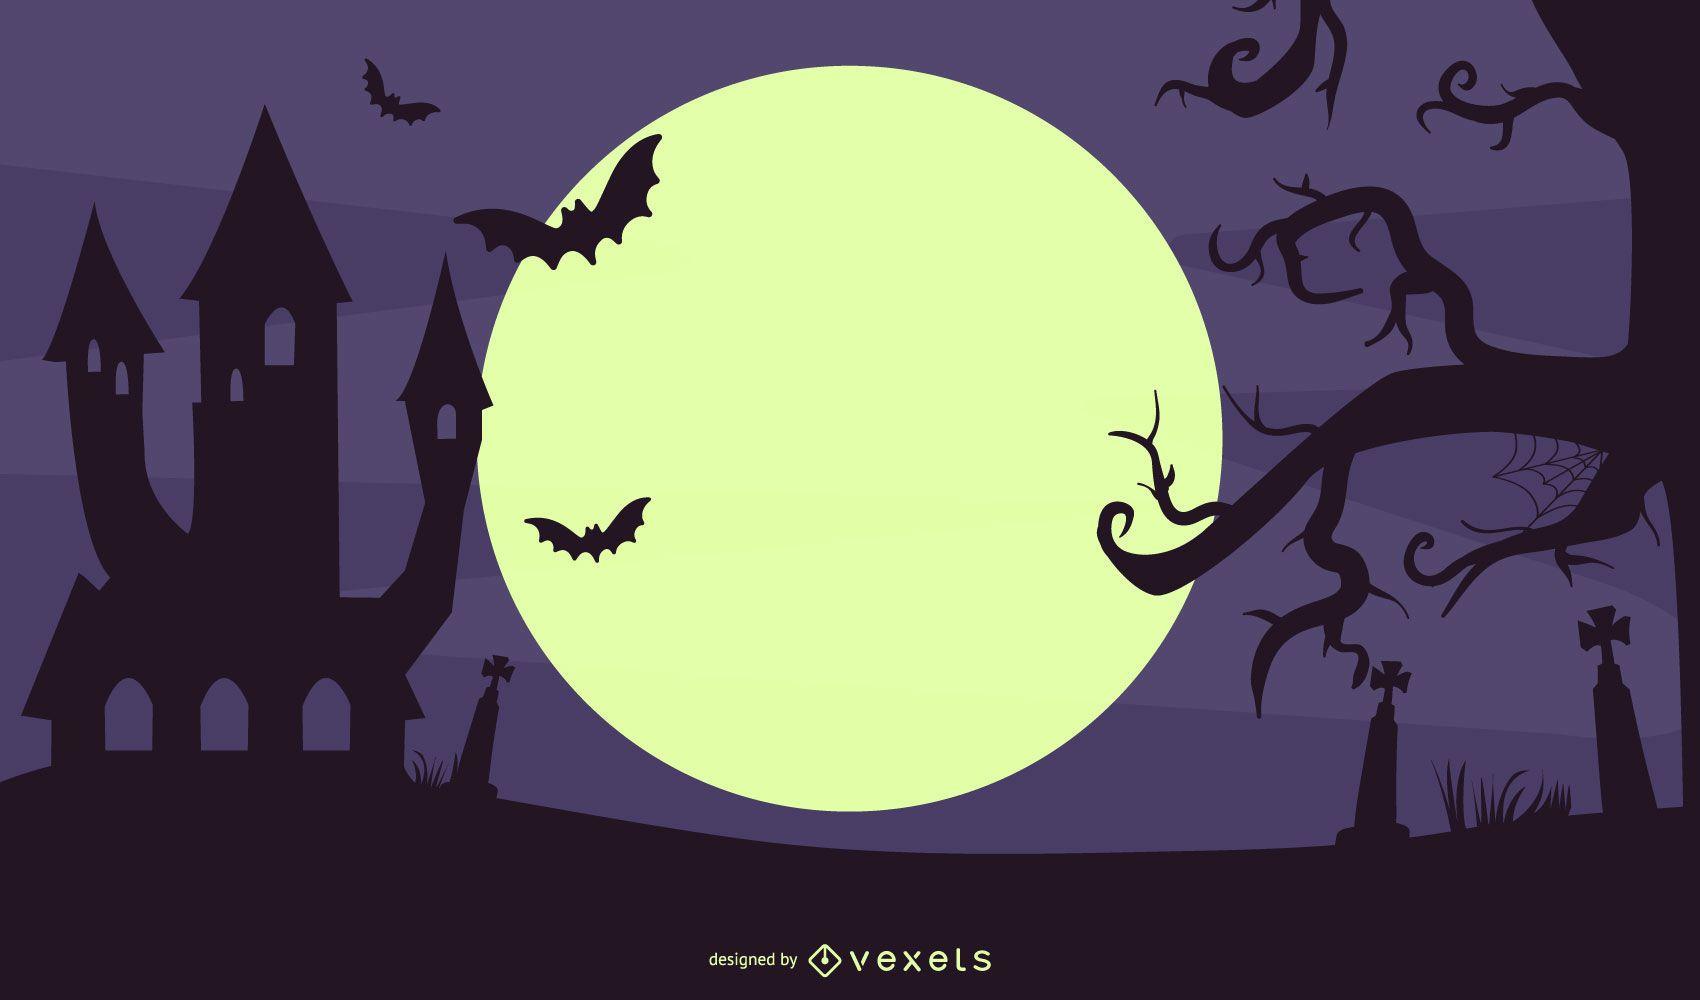 Creepy Halloween Night Illustration